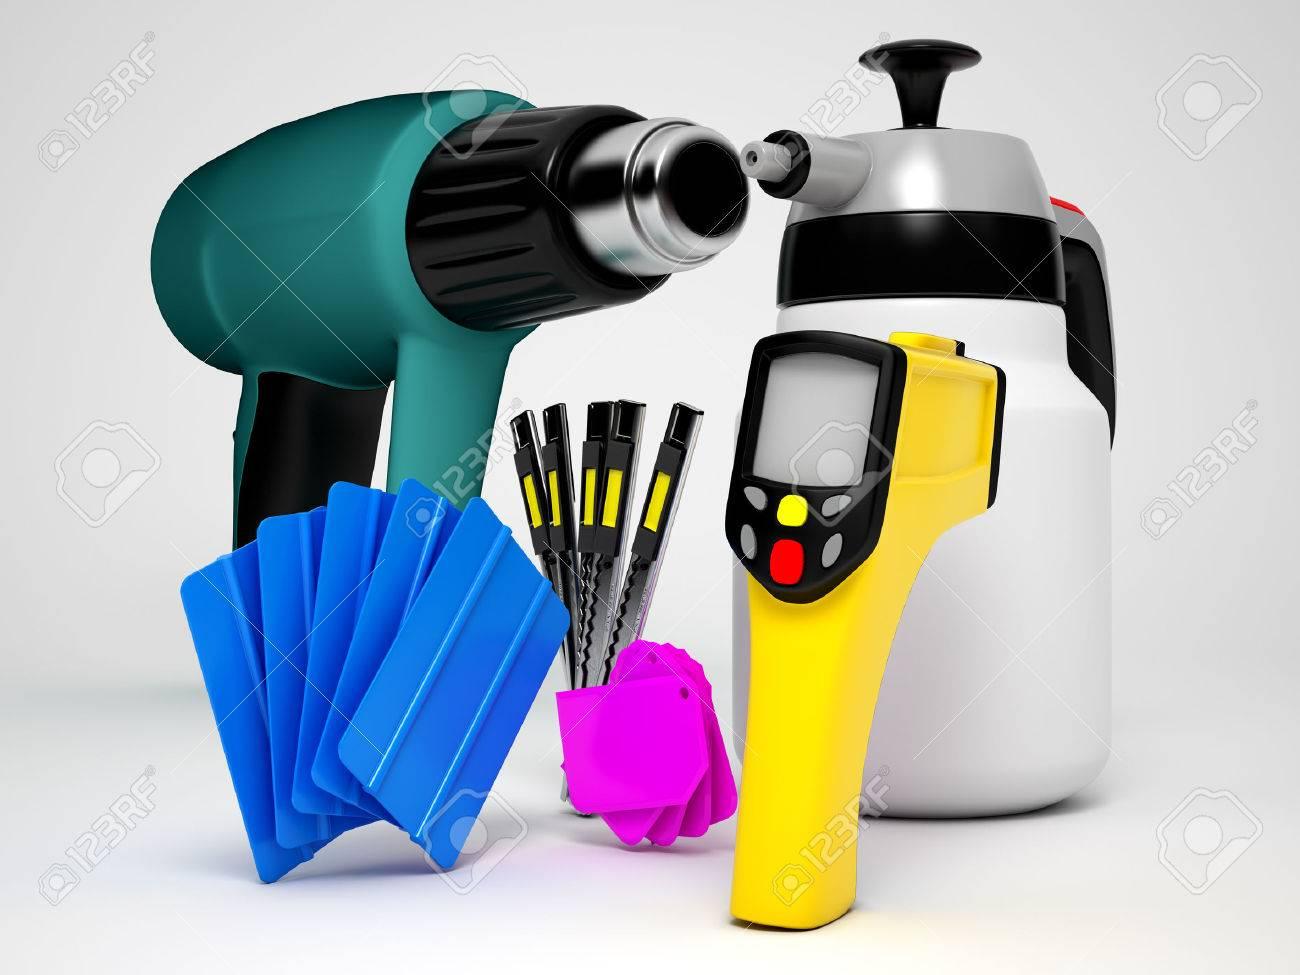 Car wrapping tools. High qualiti  photo realistic render Standard-Bild - 39042755